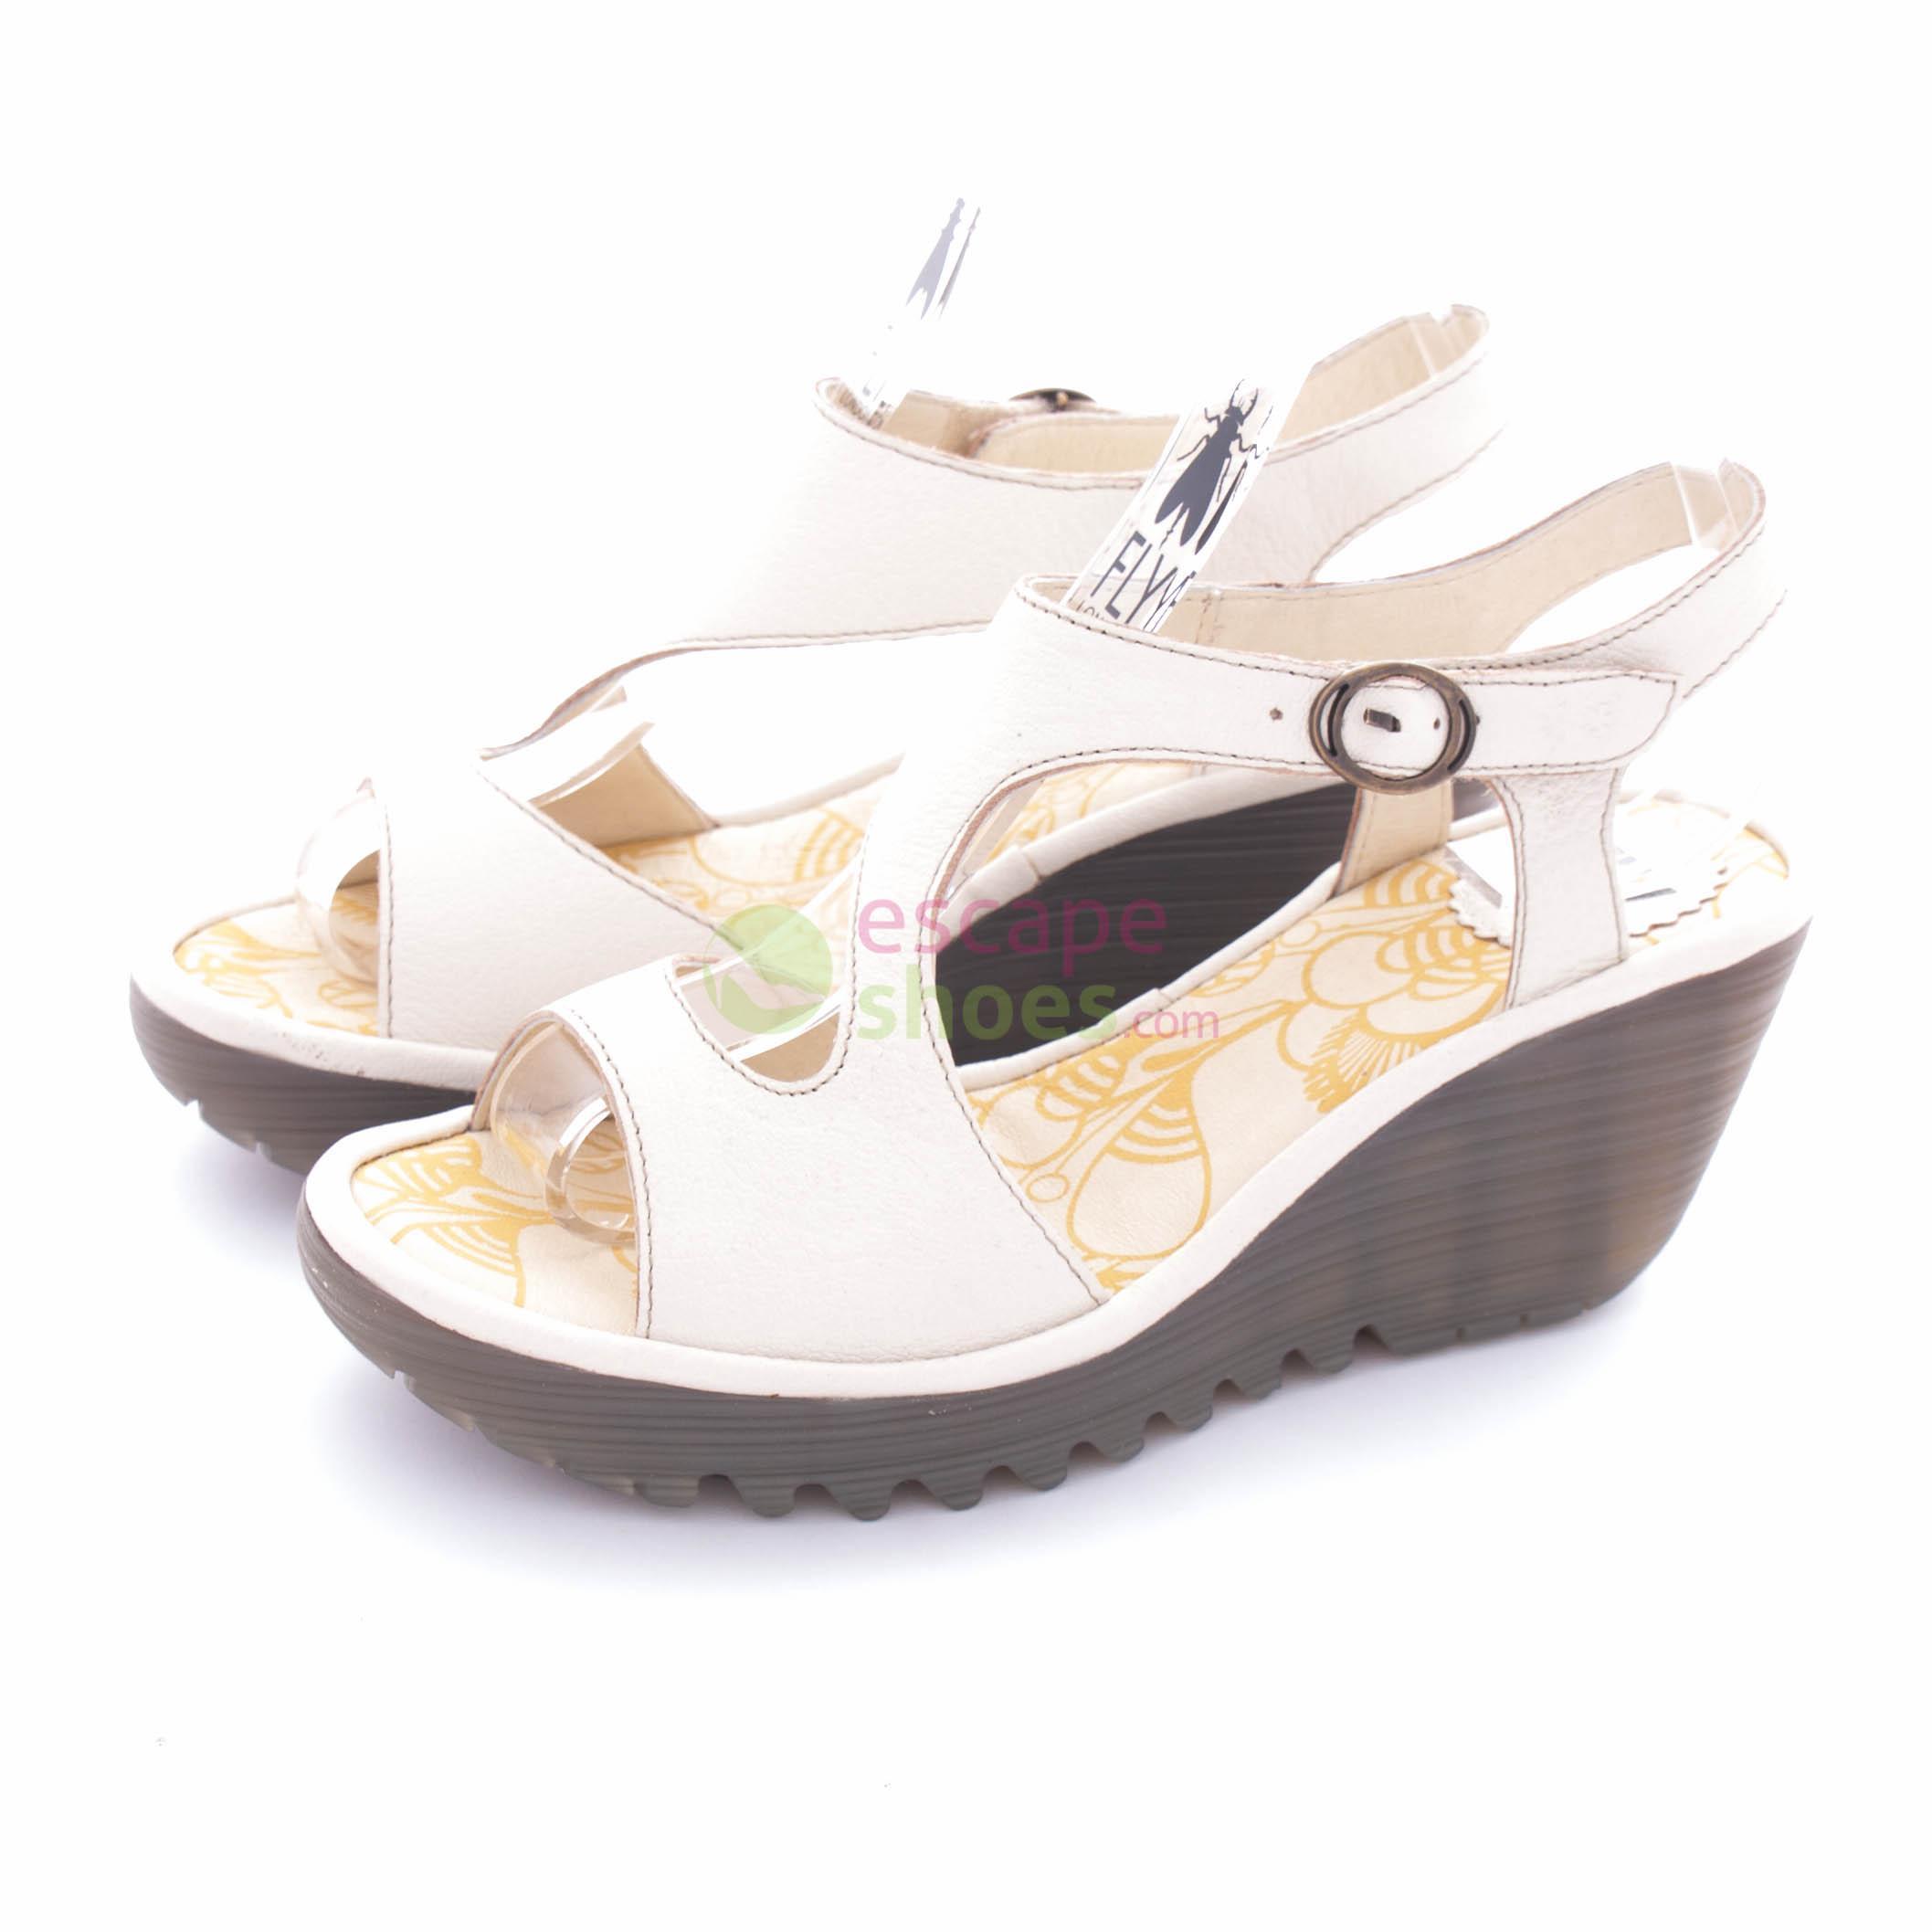 0694a9c18e939 Sandals FLY LONDON Yellow Yanca White P500569002 - EscapeShoes